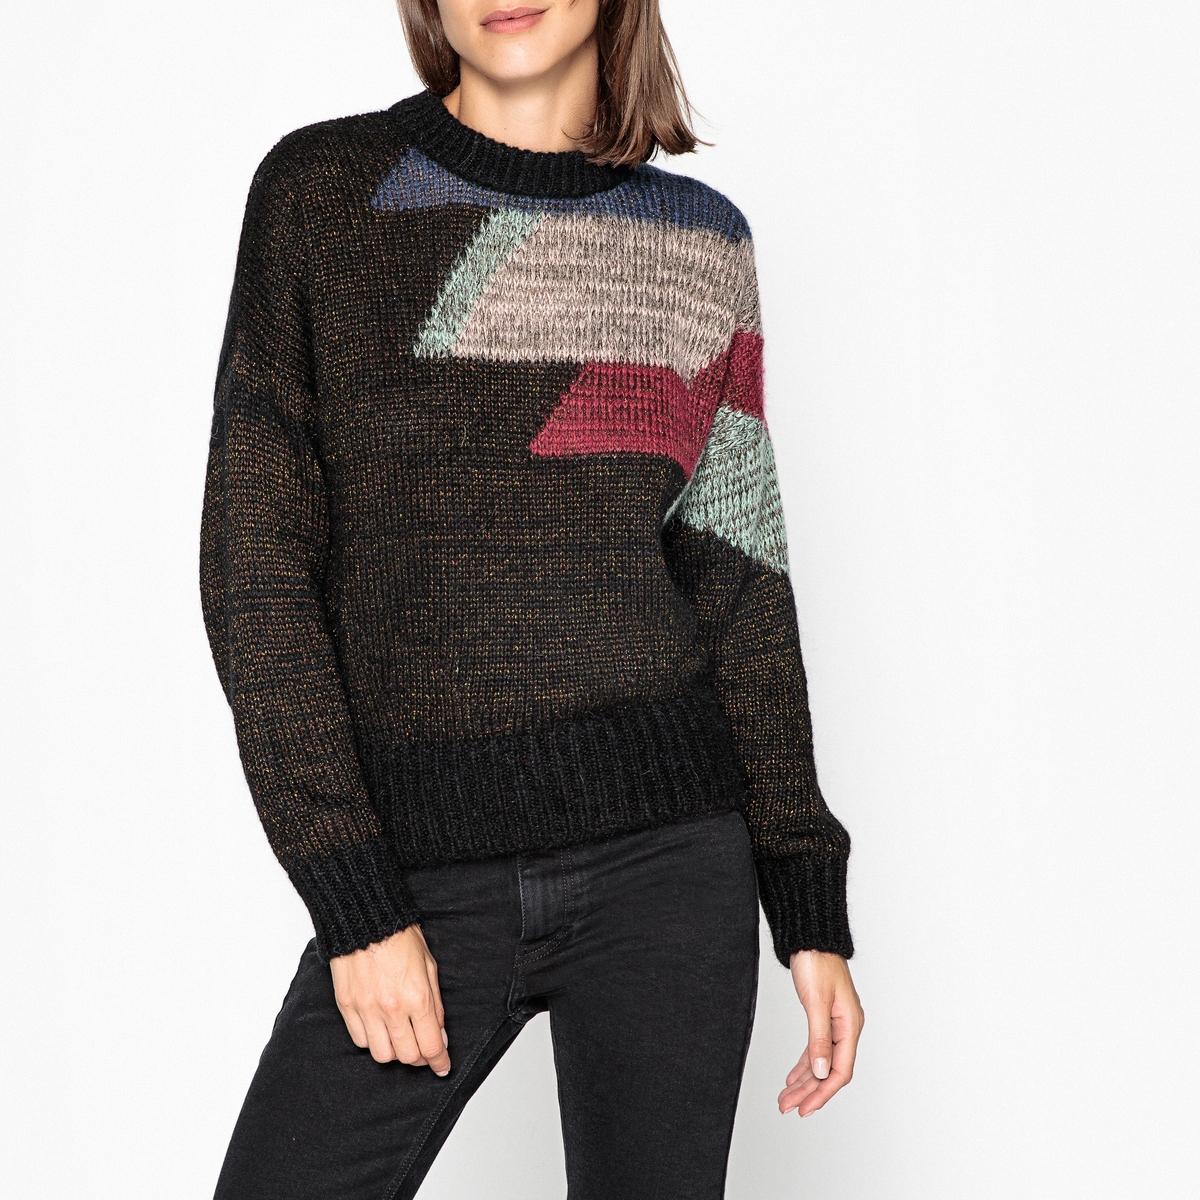 Пуловер с круглым вырезом из тонкого трикотажа AURORE baffin crystal aurore boreale page 2